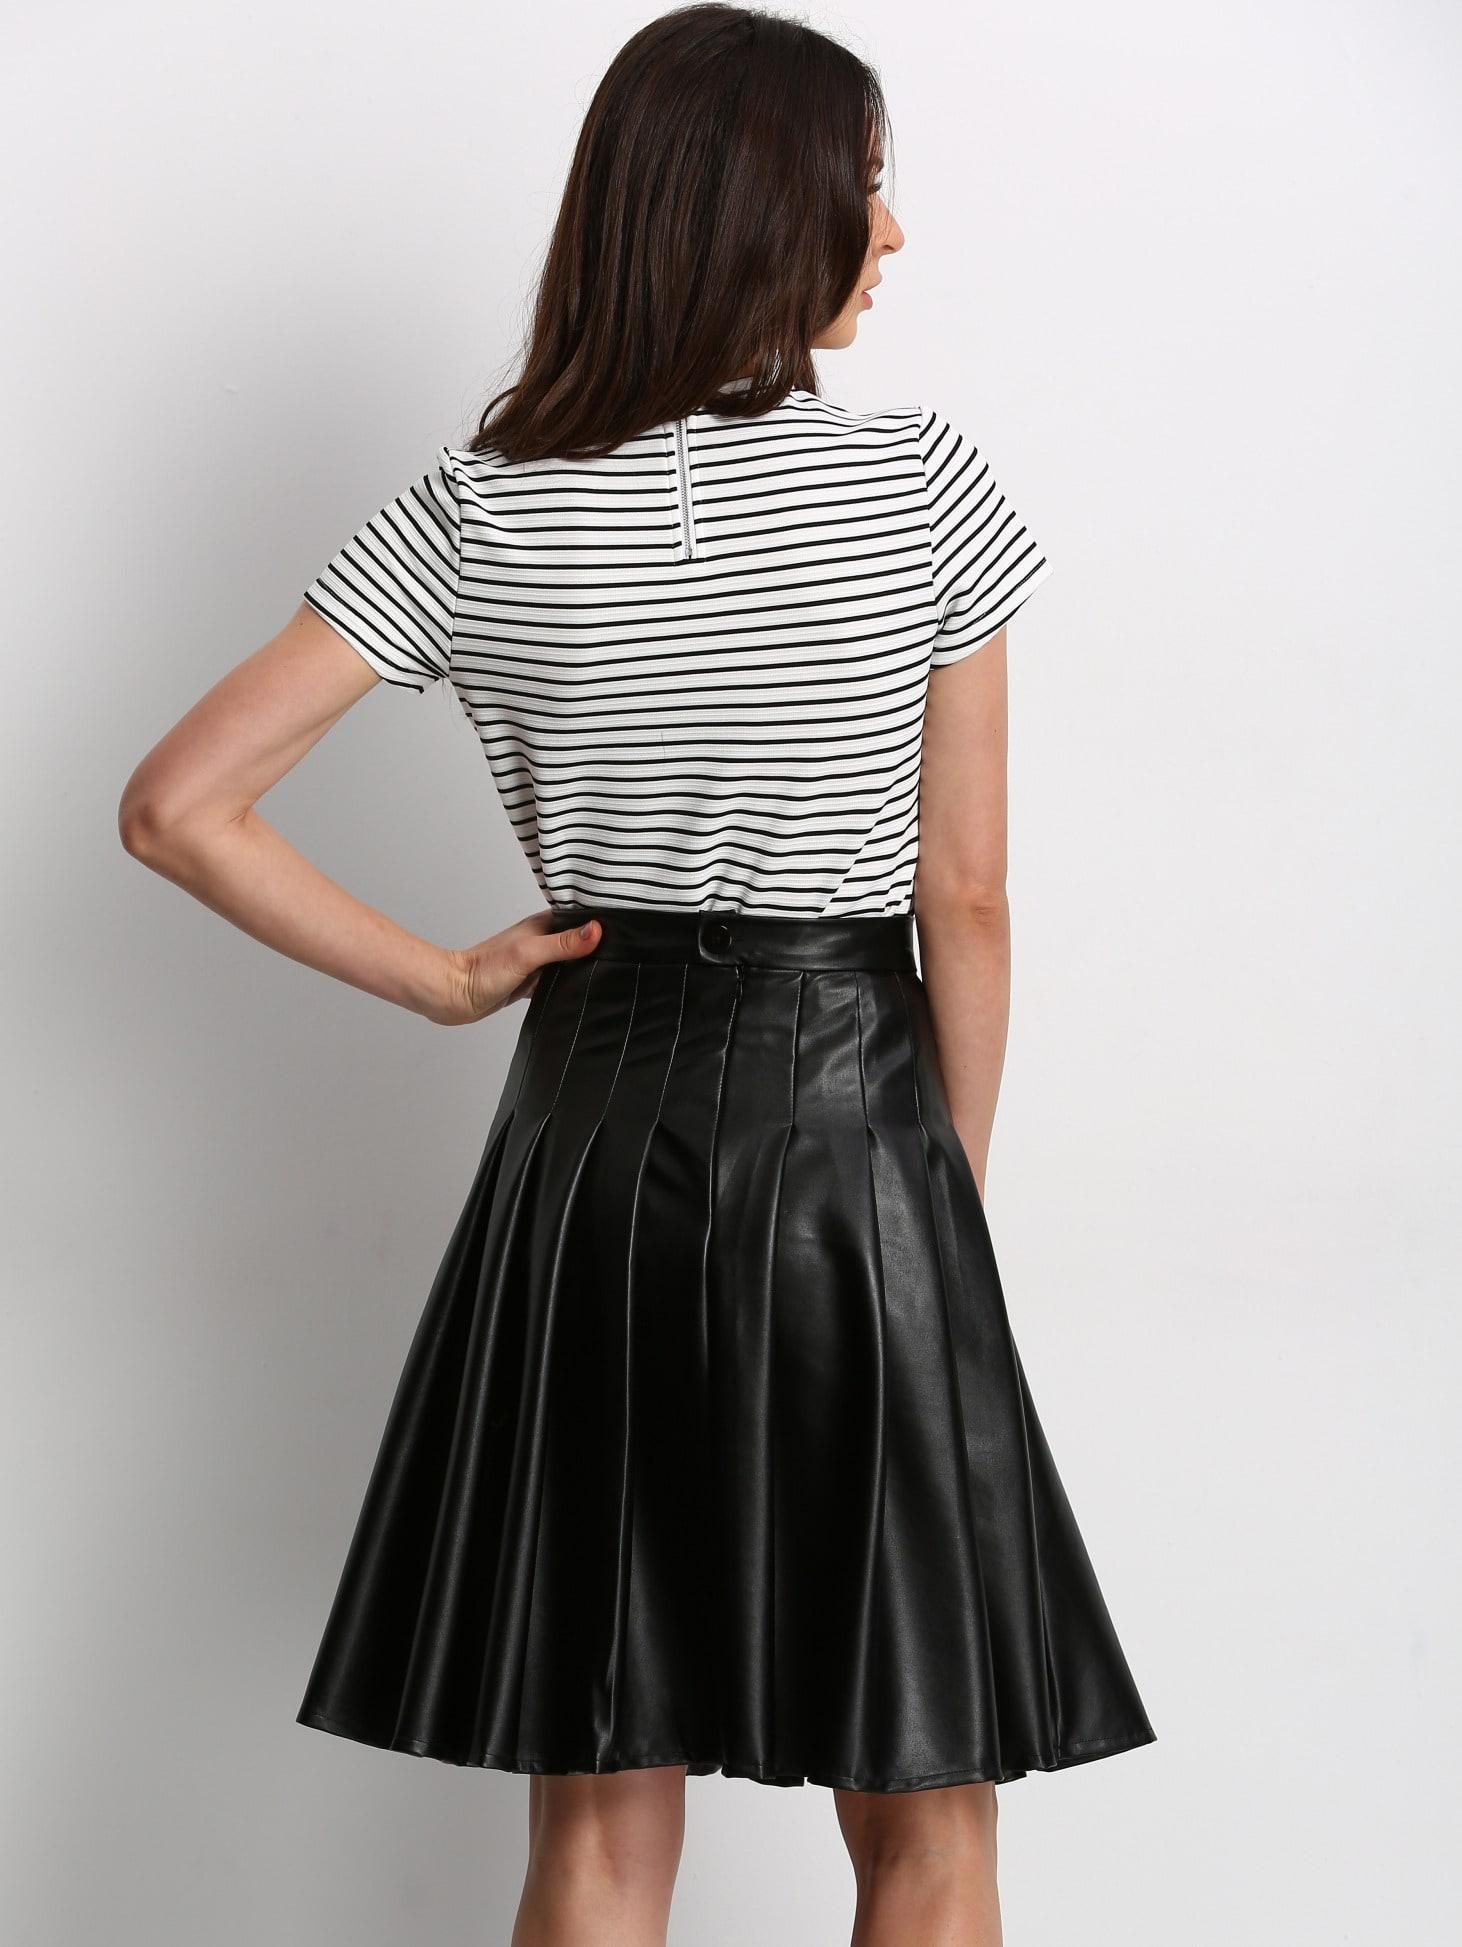 jupe pliss e en simili cuir noir french shein sheinside. Black Bedroom Furniture Sets. Home Design Ideas